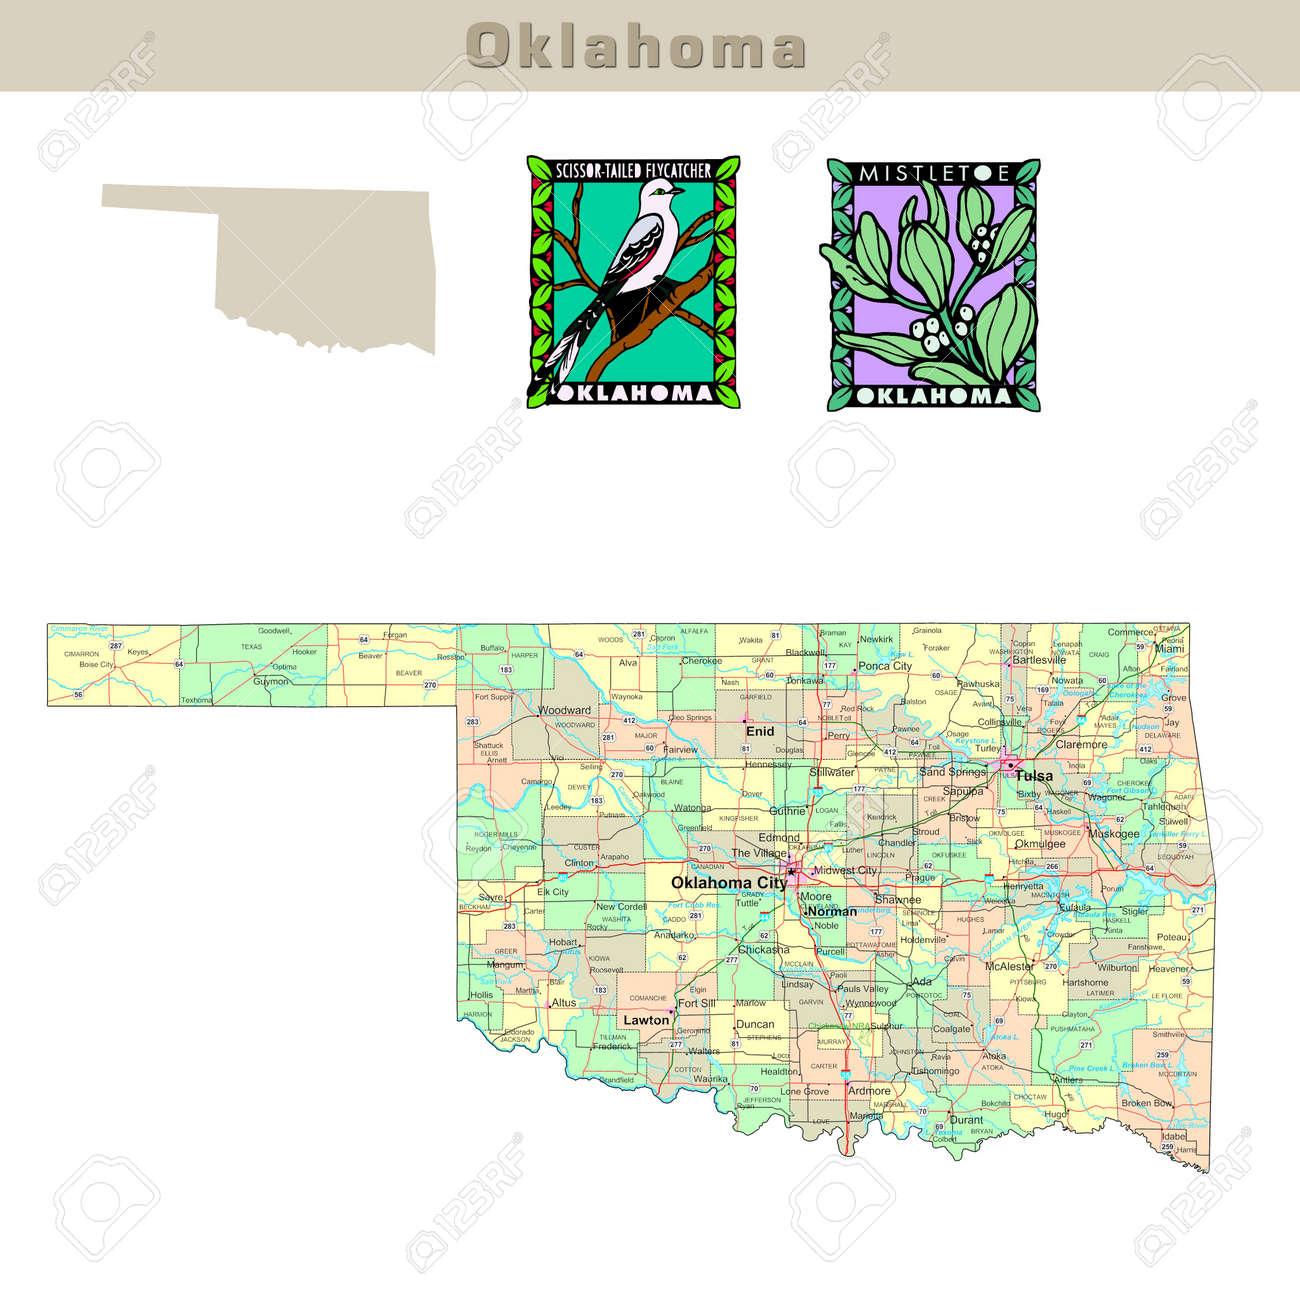 FileMap Of USA OKsvg Wikimedia Commons Oklahoma Geological Survey - Oklahoma counties road map usa